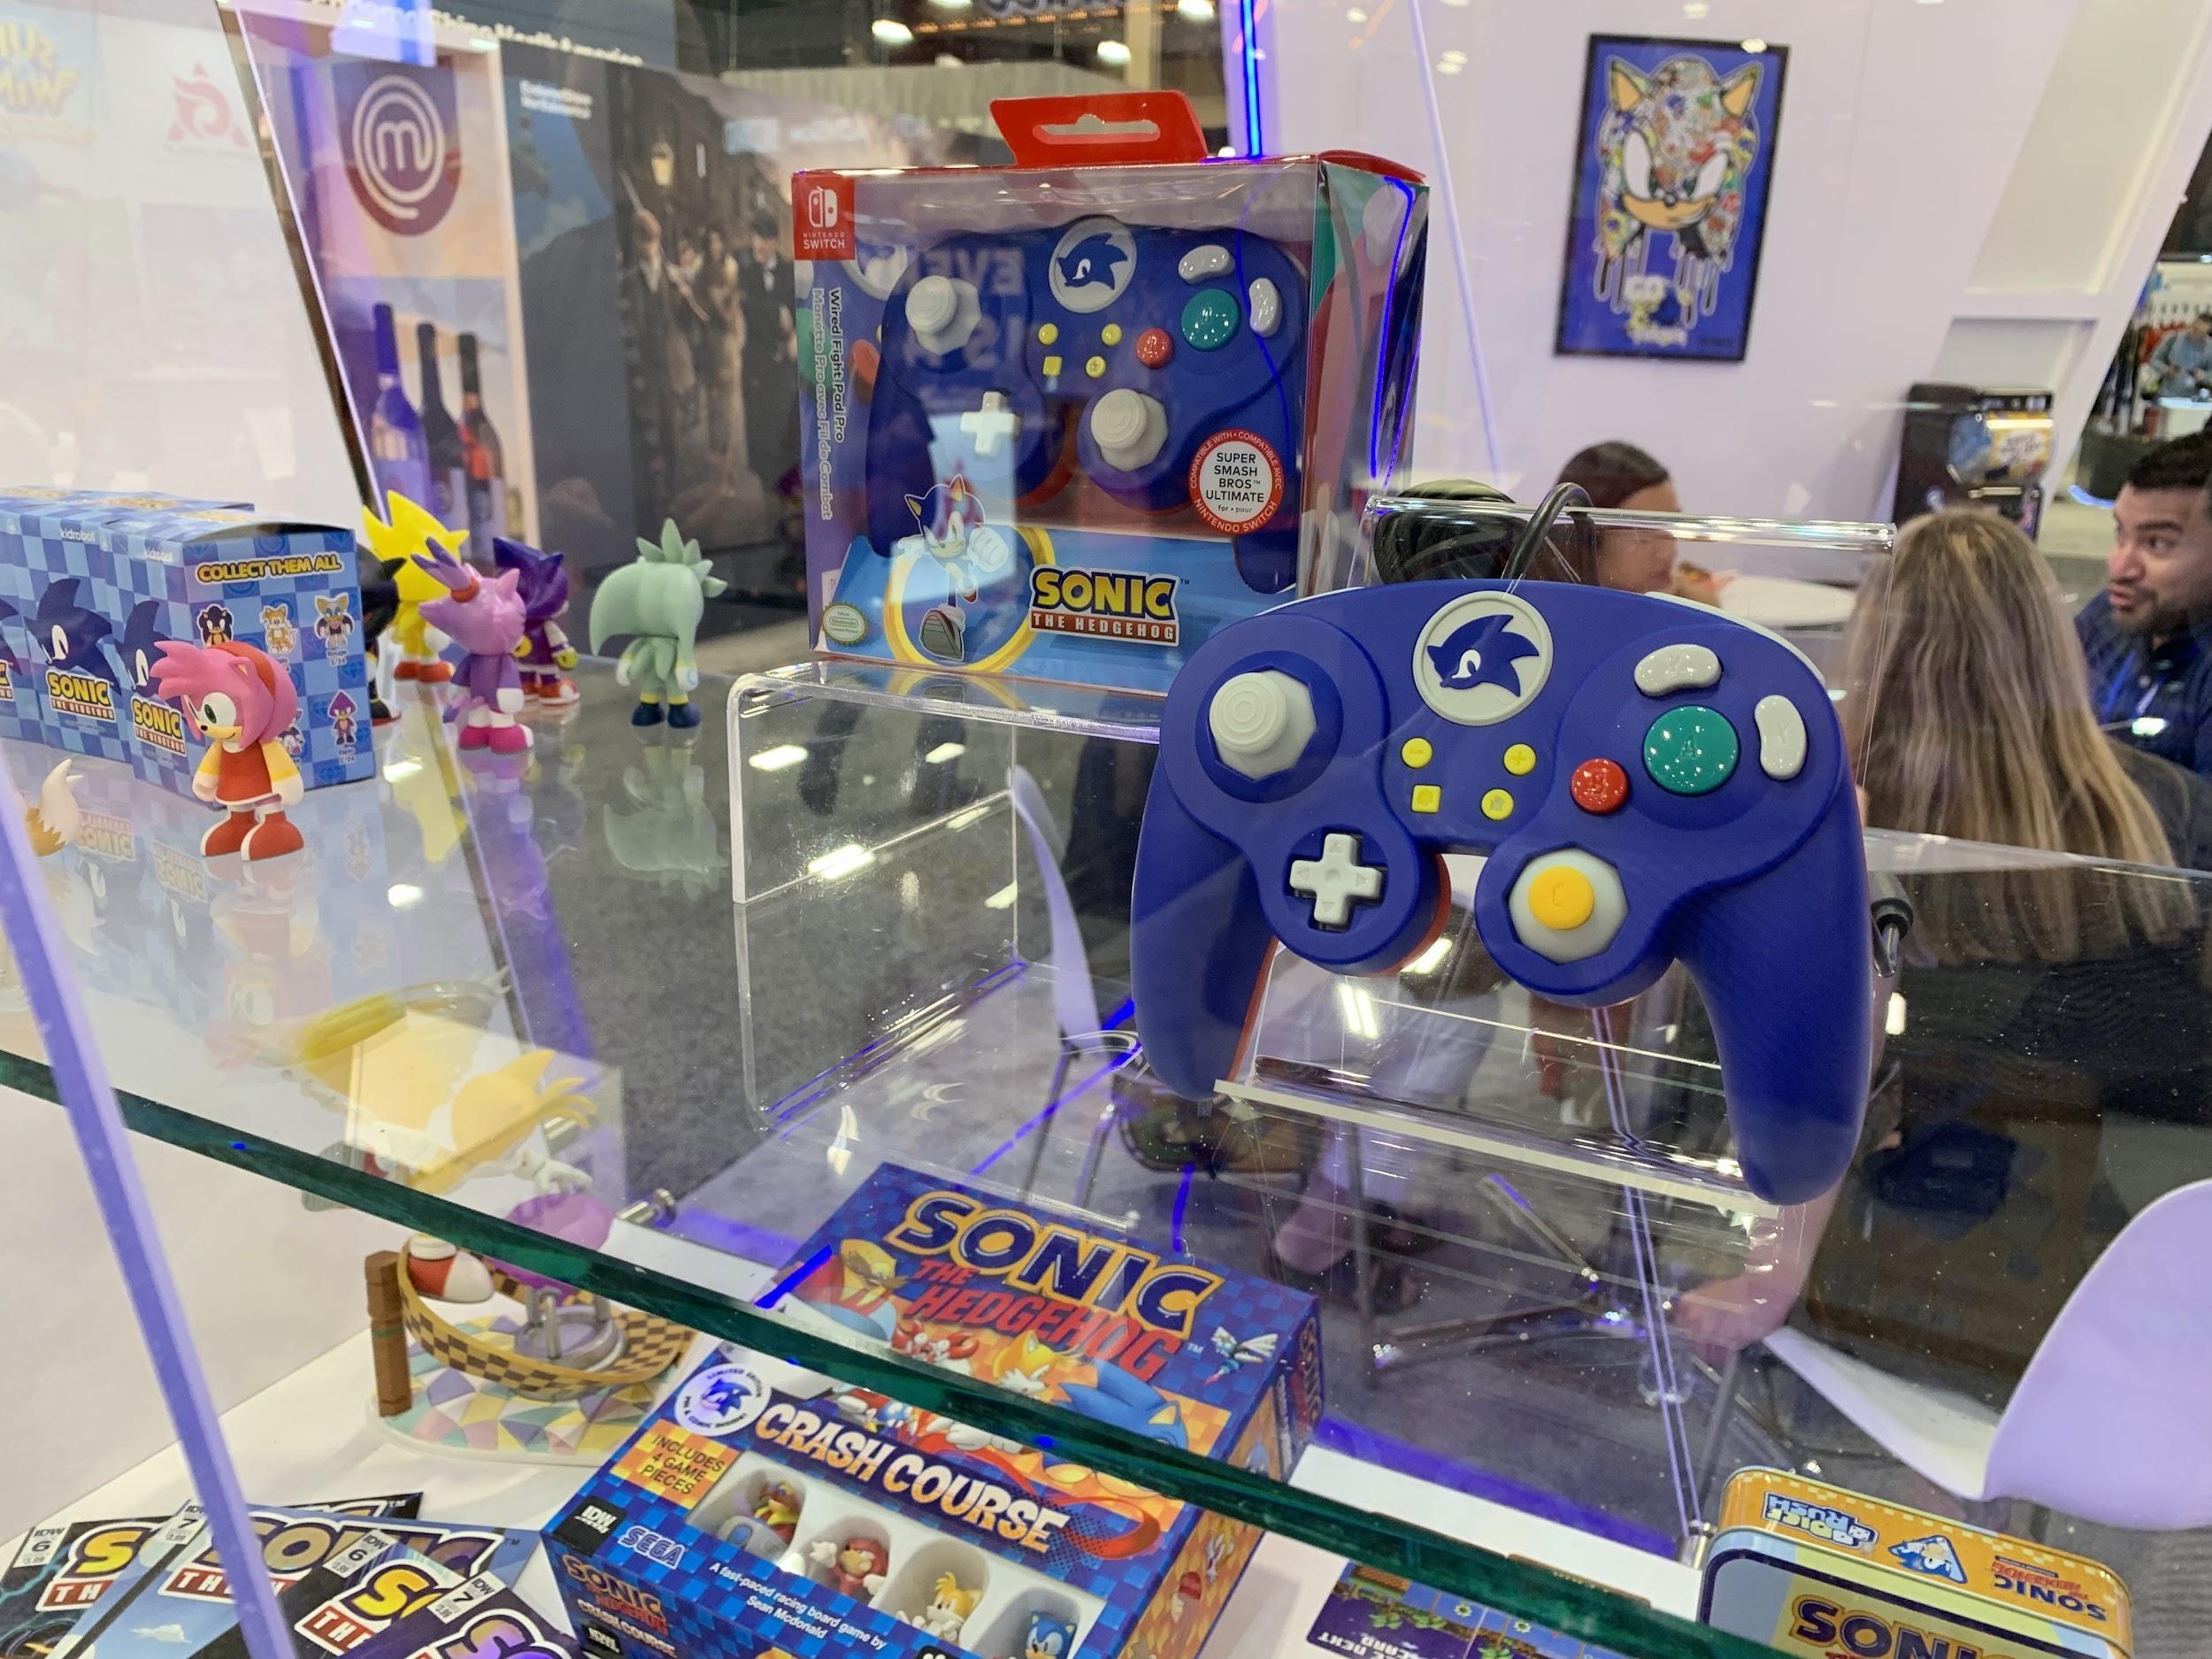 sonic the hedgehog gamecube games